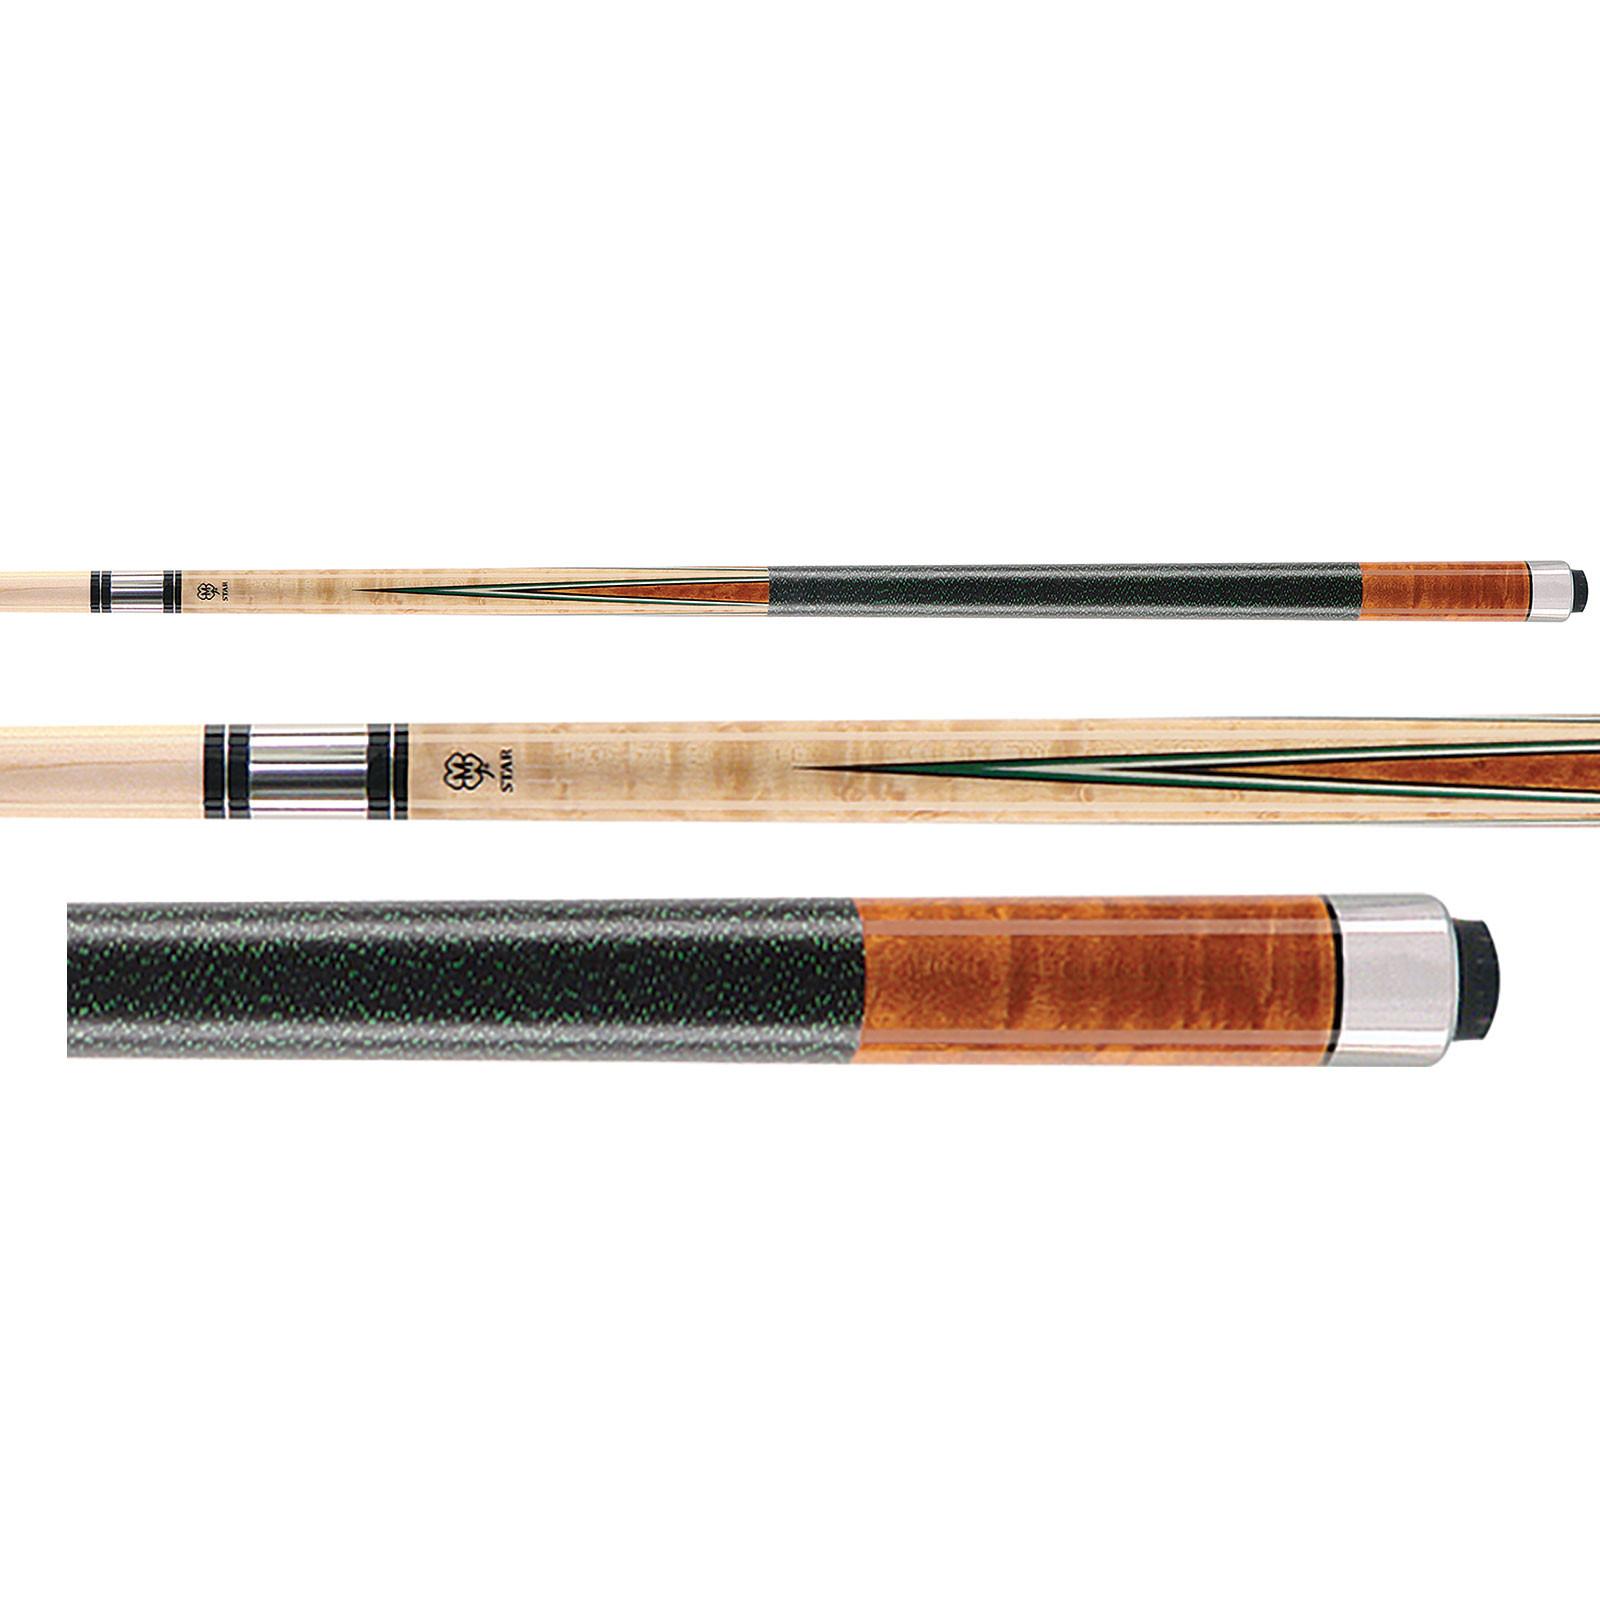 McDermott Star S52 Cherry Billiards Pool Cue Stick